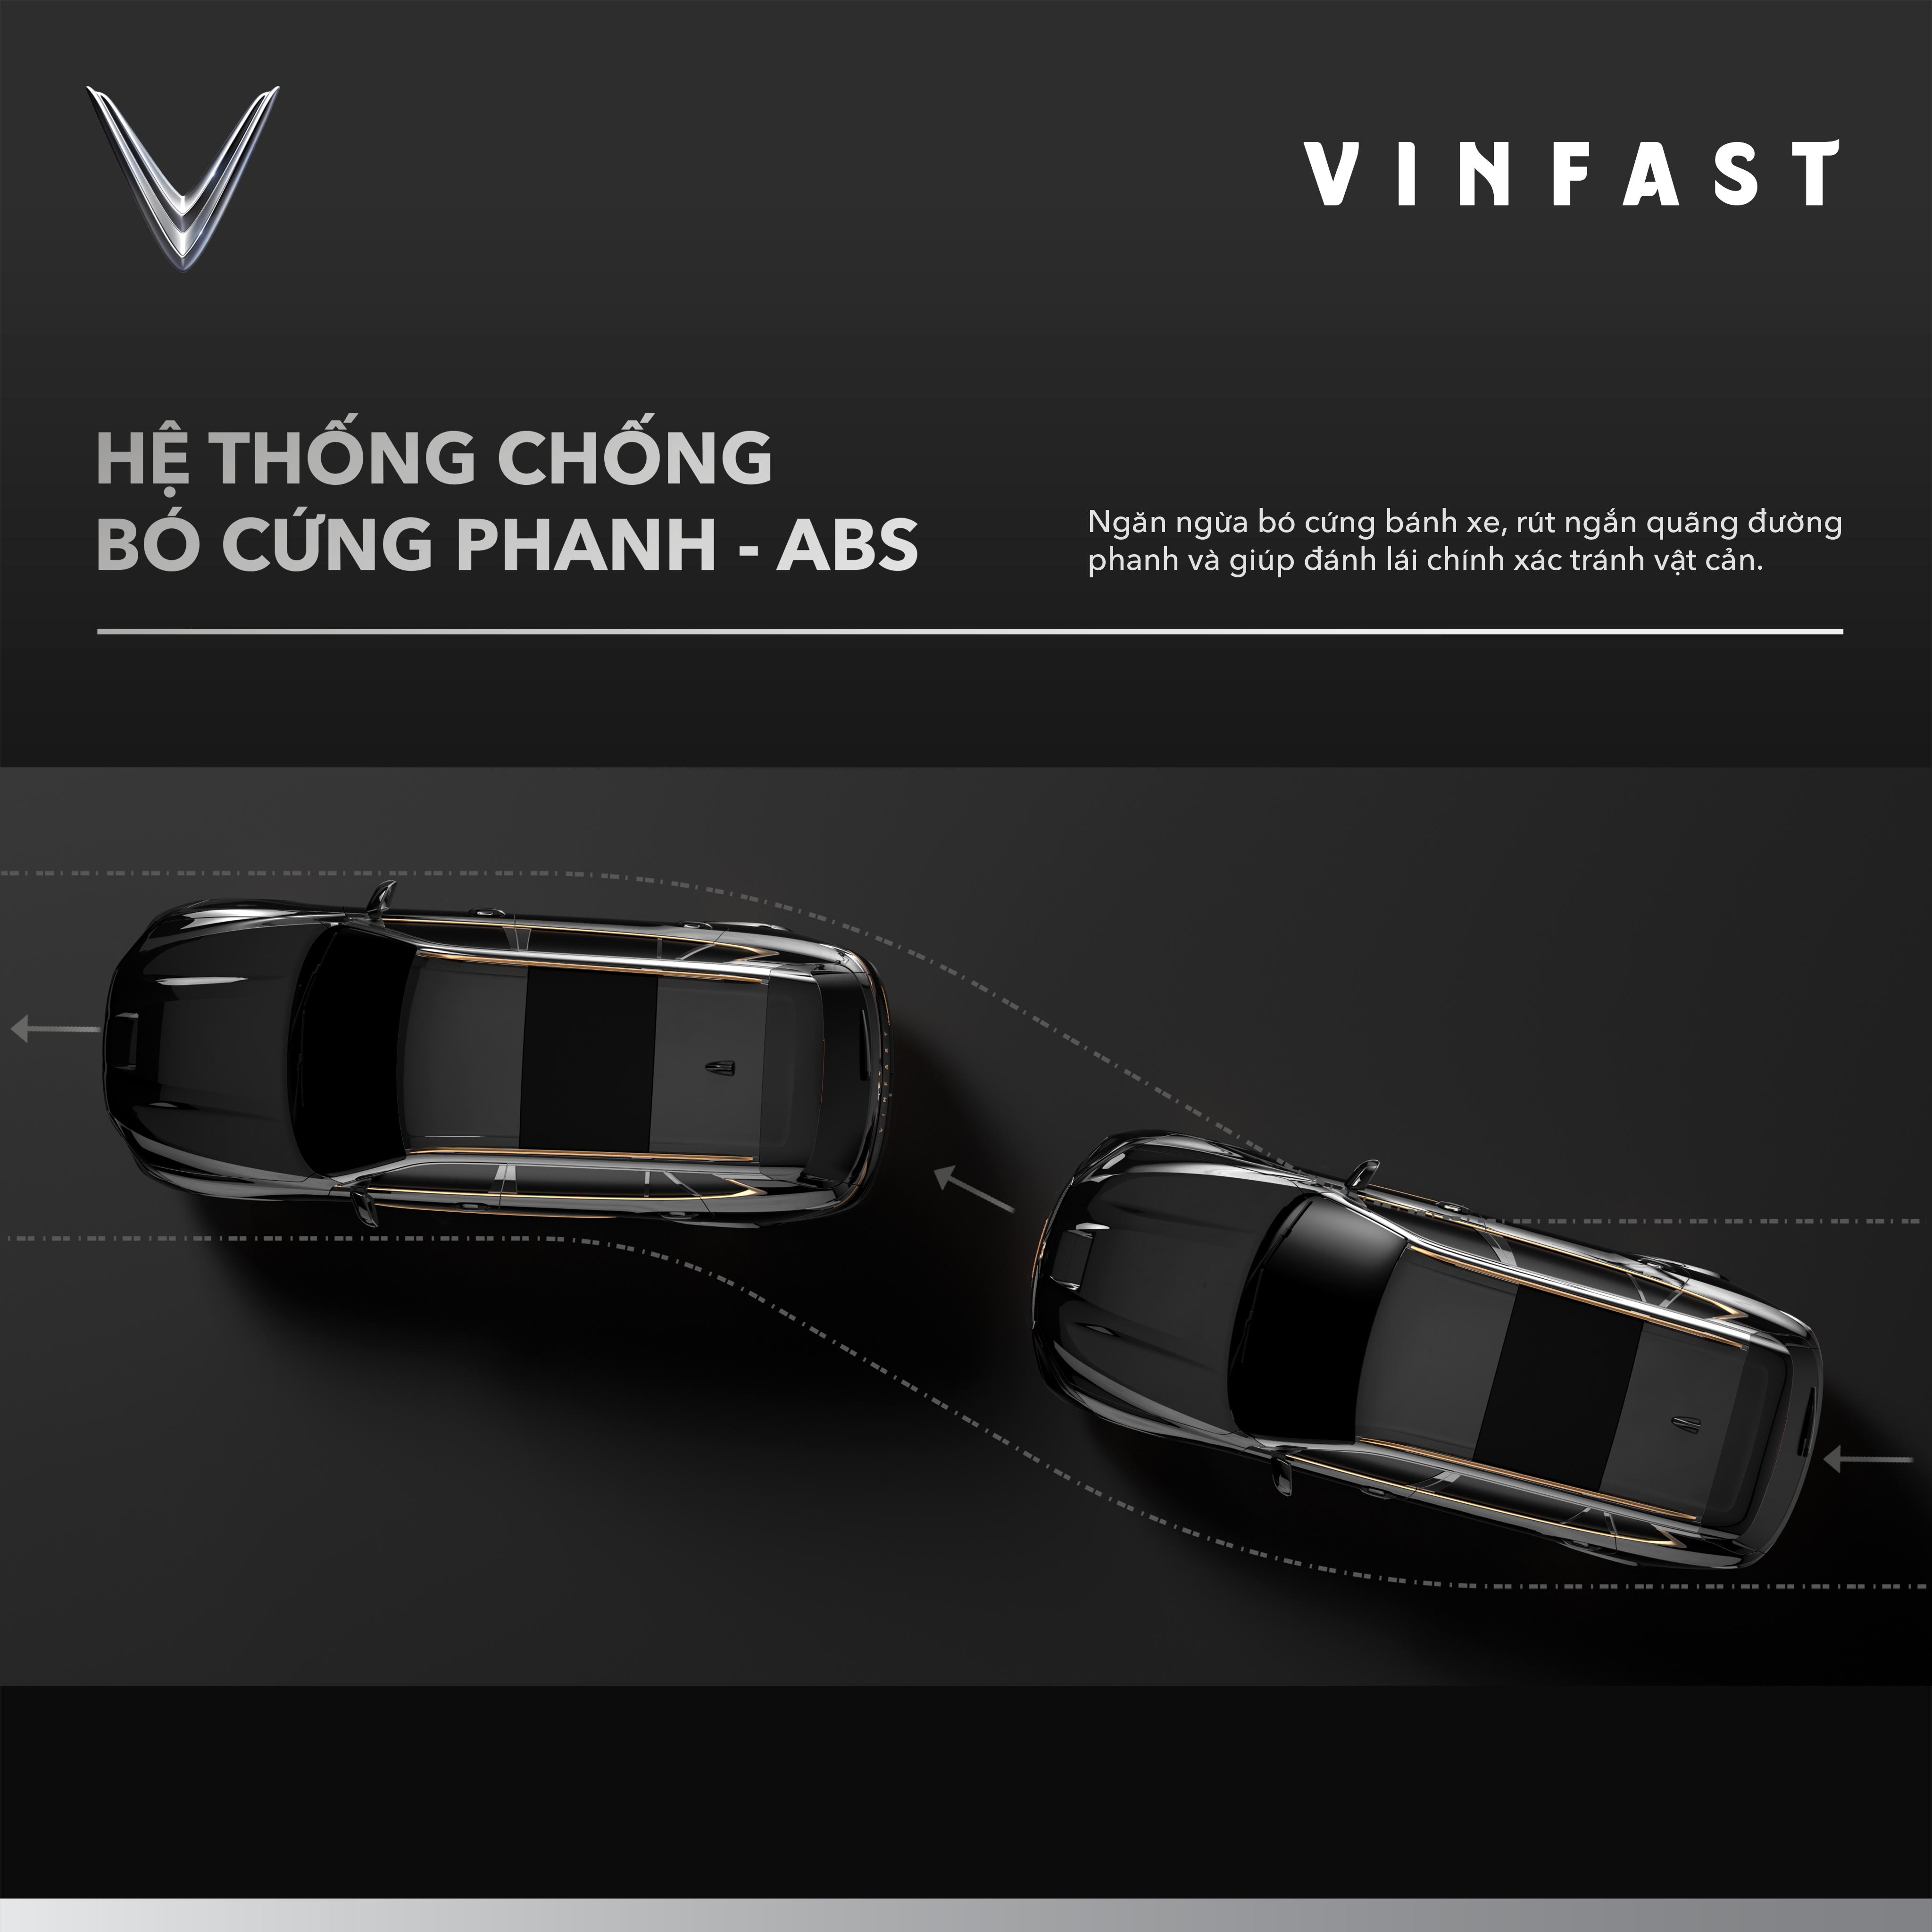 Mua vinfast president he thong phanh 1 0